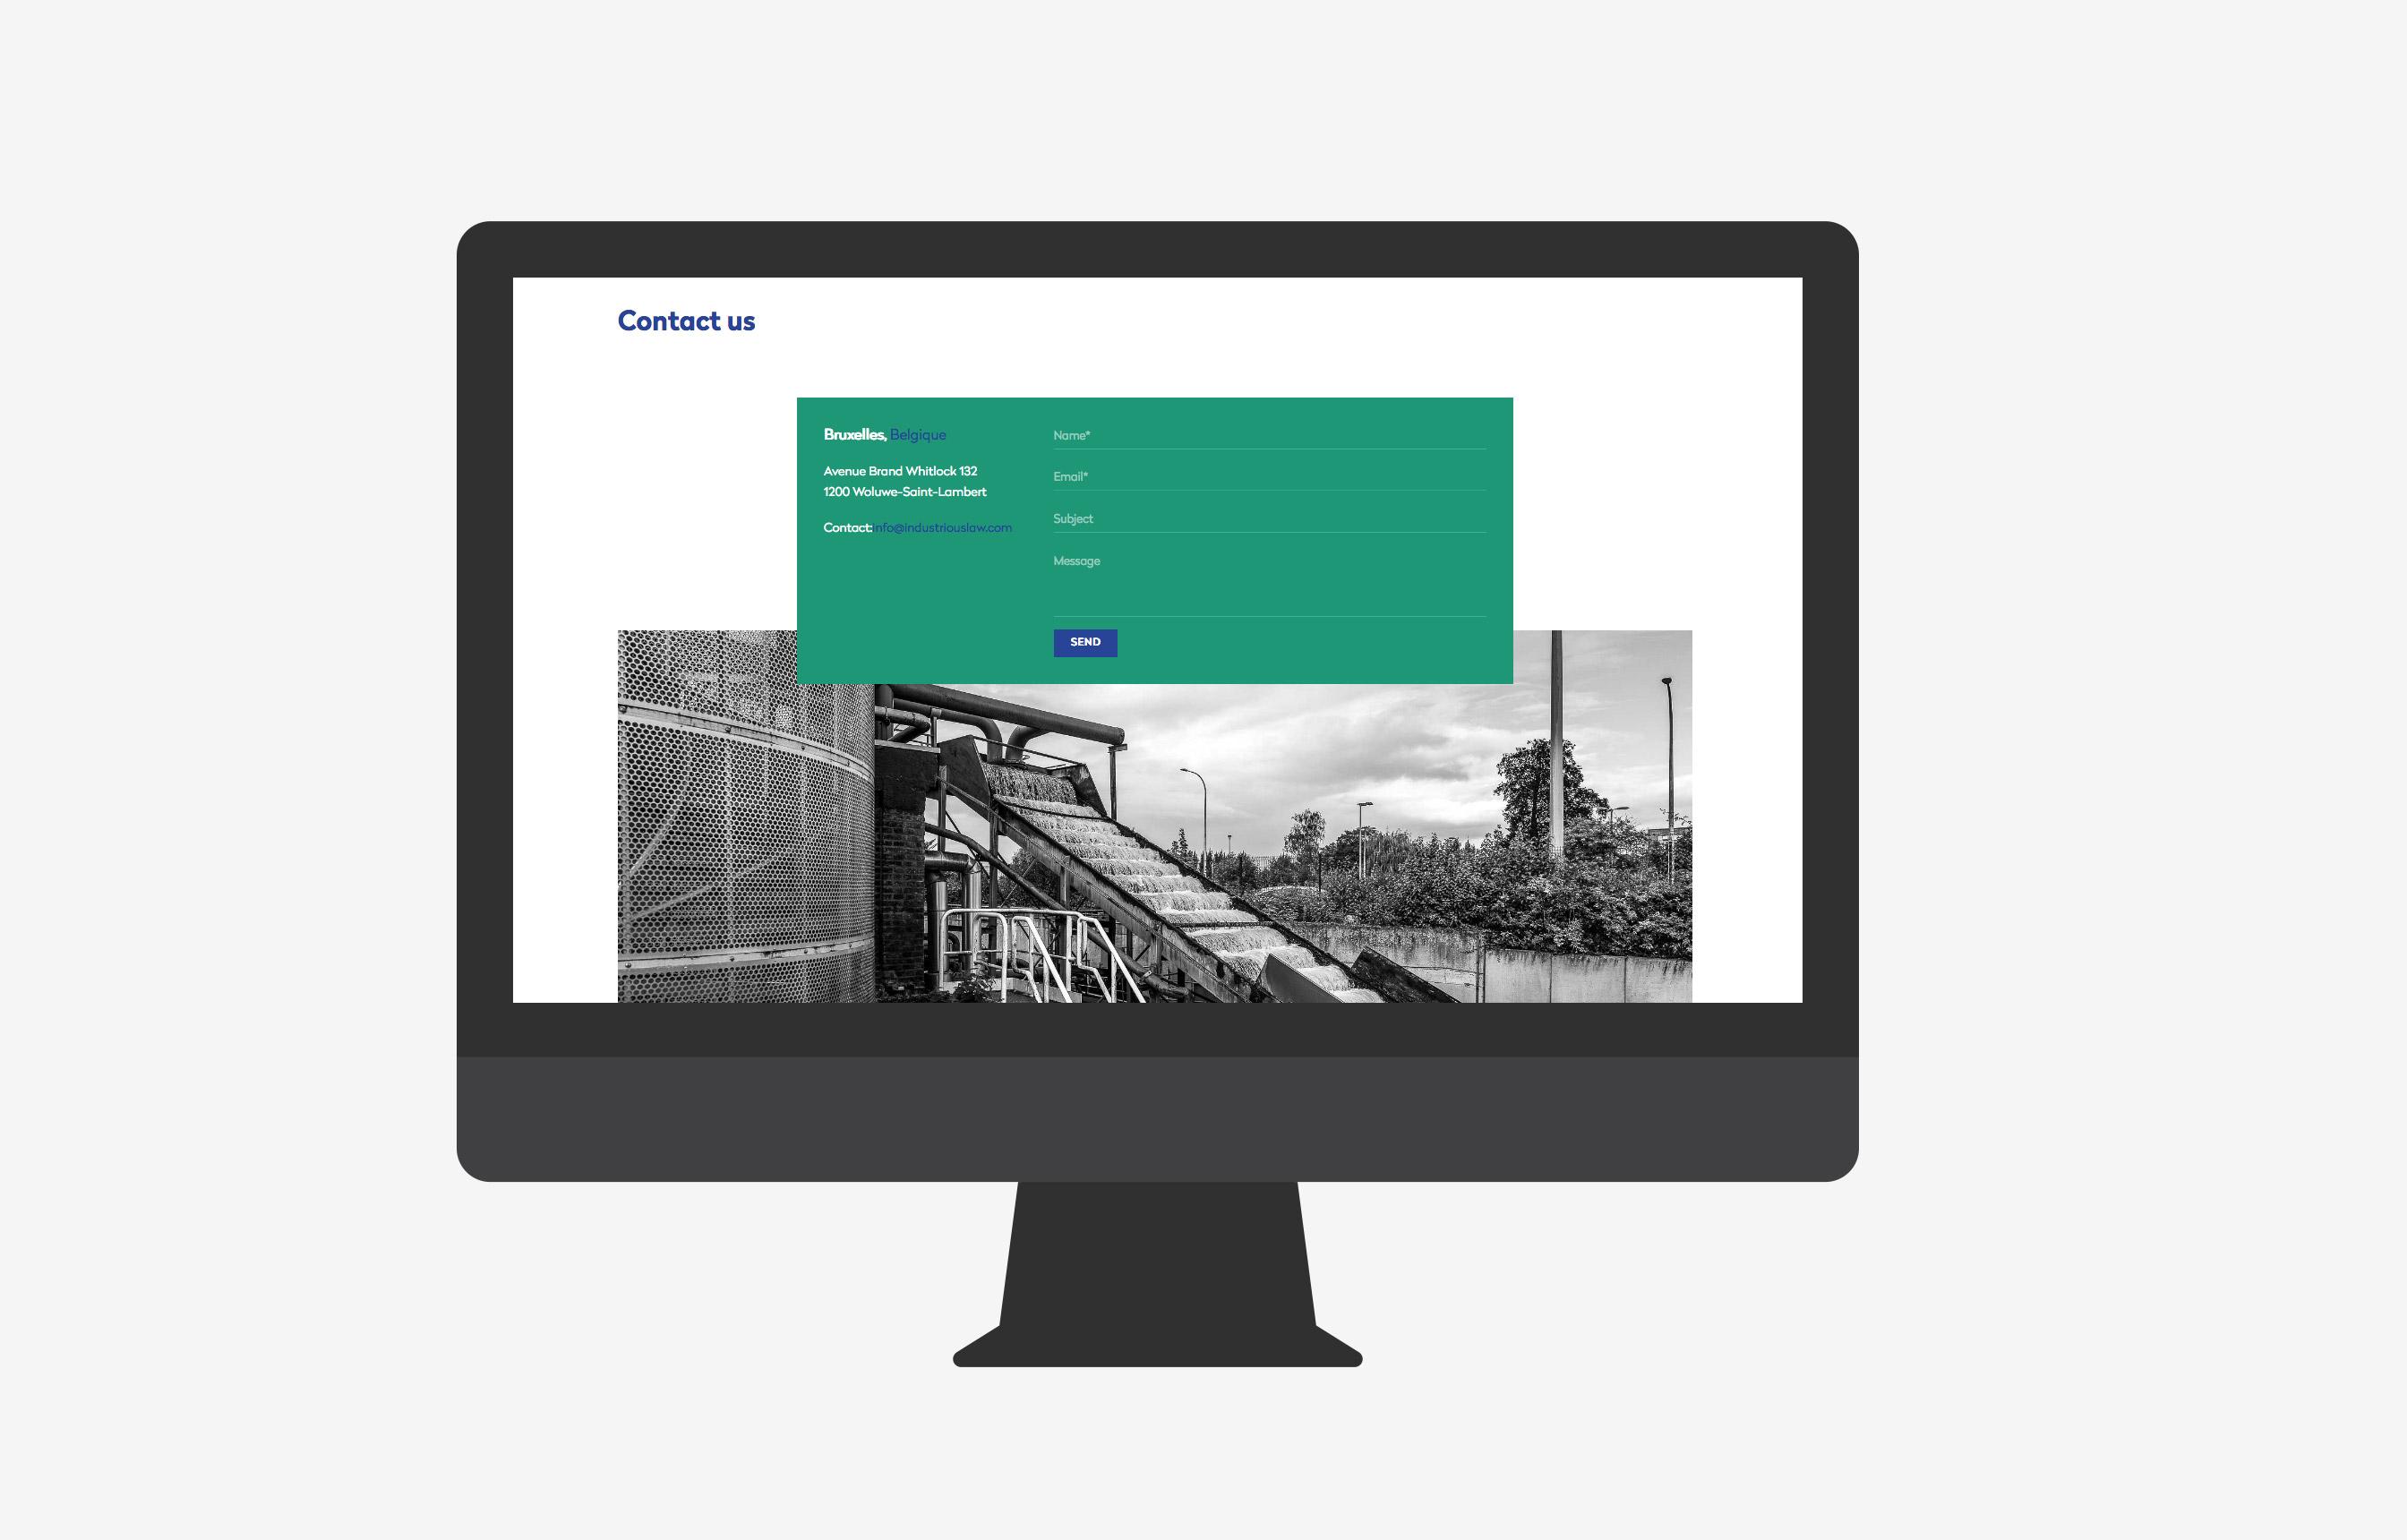 05-industrious-pikteo-webdesign-graphic-design-freelance-paris-bruxelles-londres